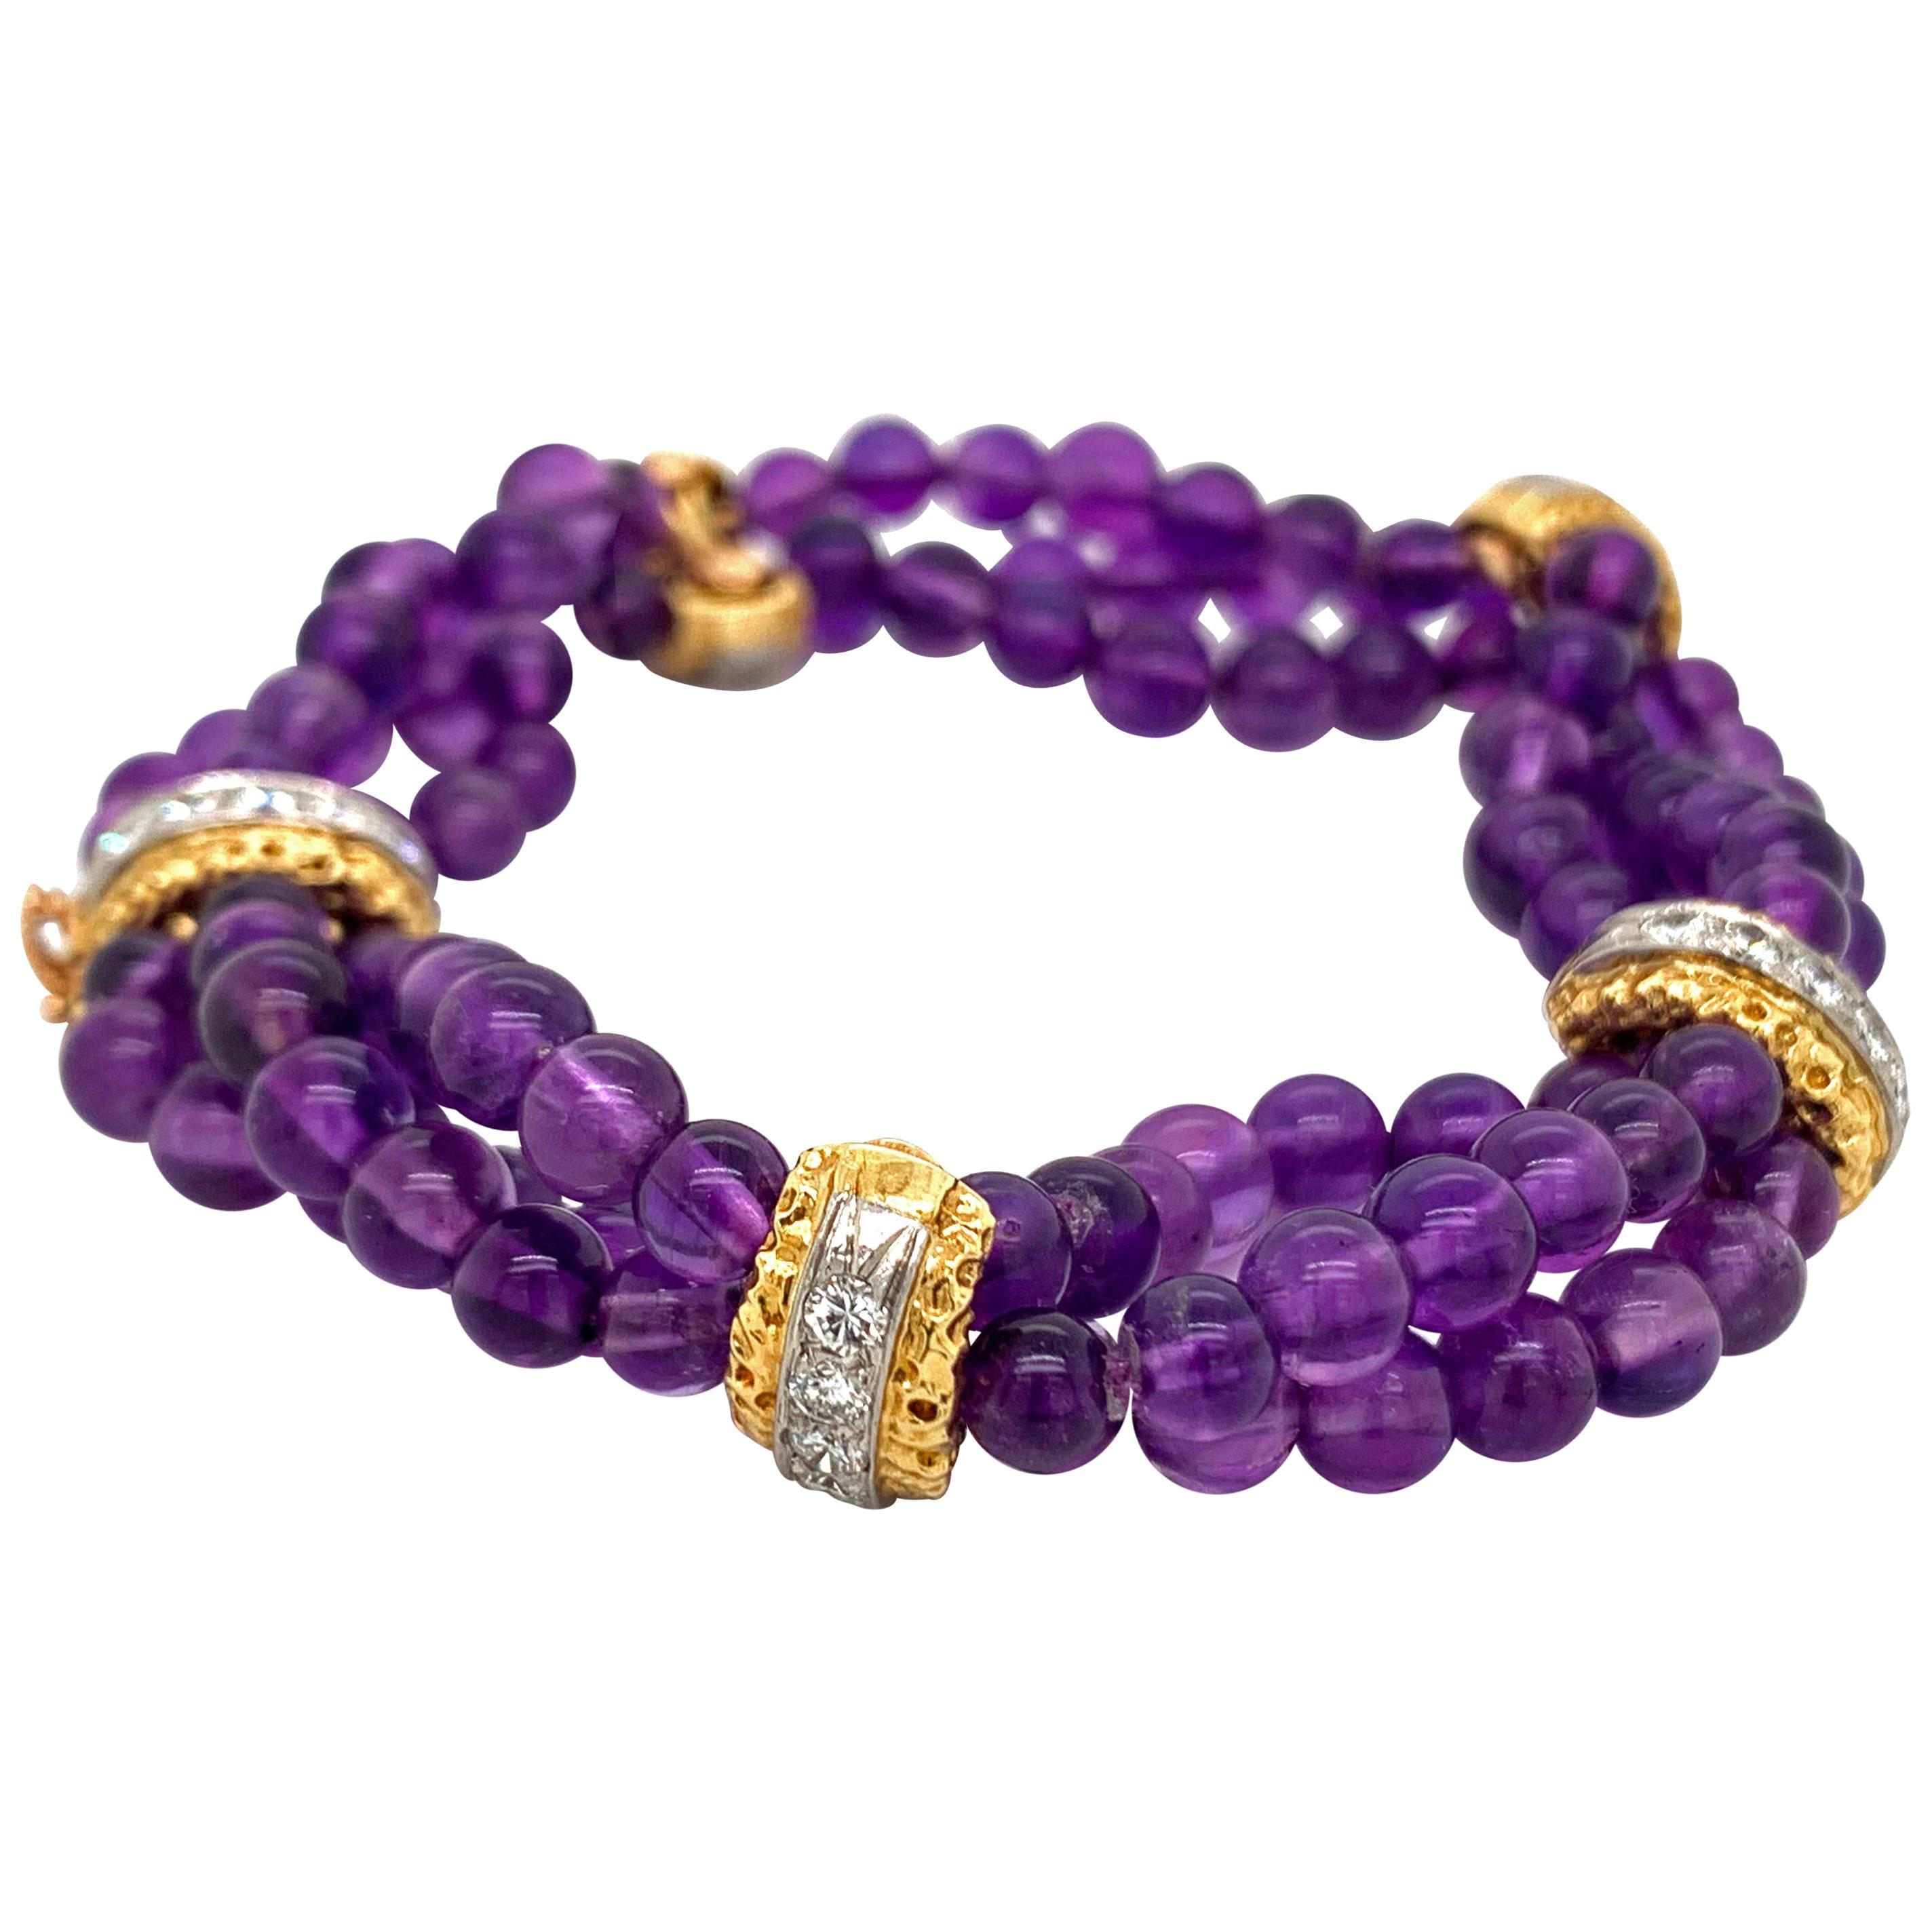 Van Cleef & Arpels 18 Karat Yellow Gold Amethyst and Diamond Bead Bracelet